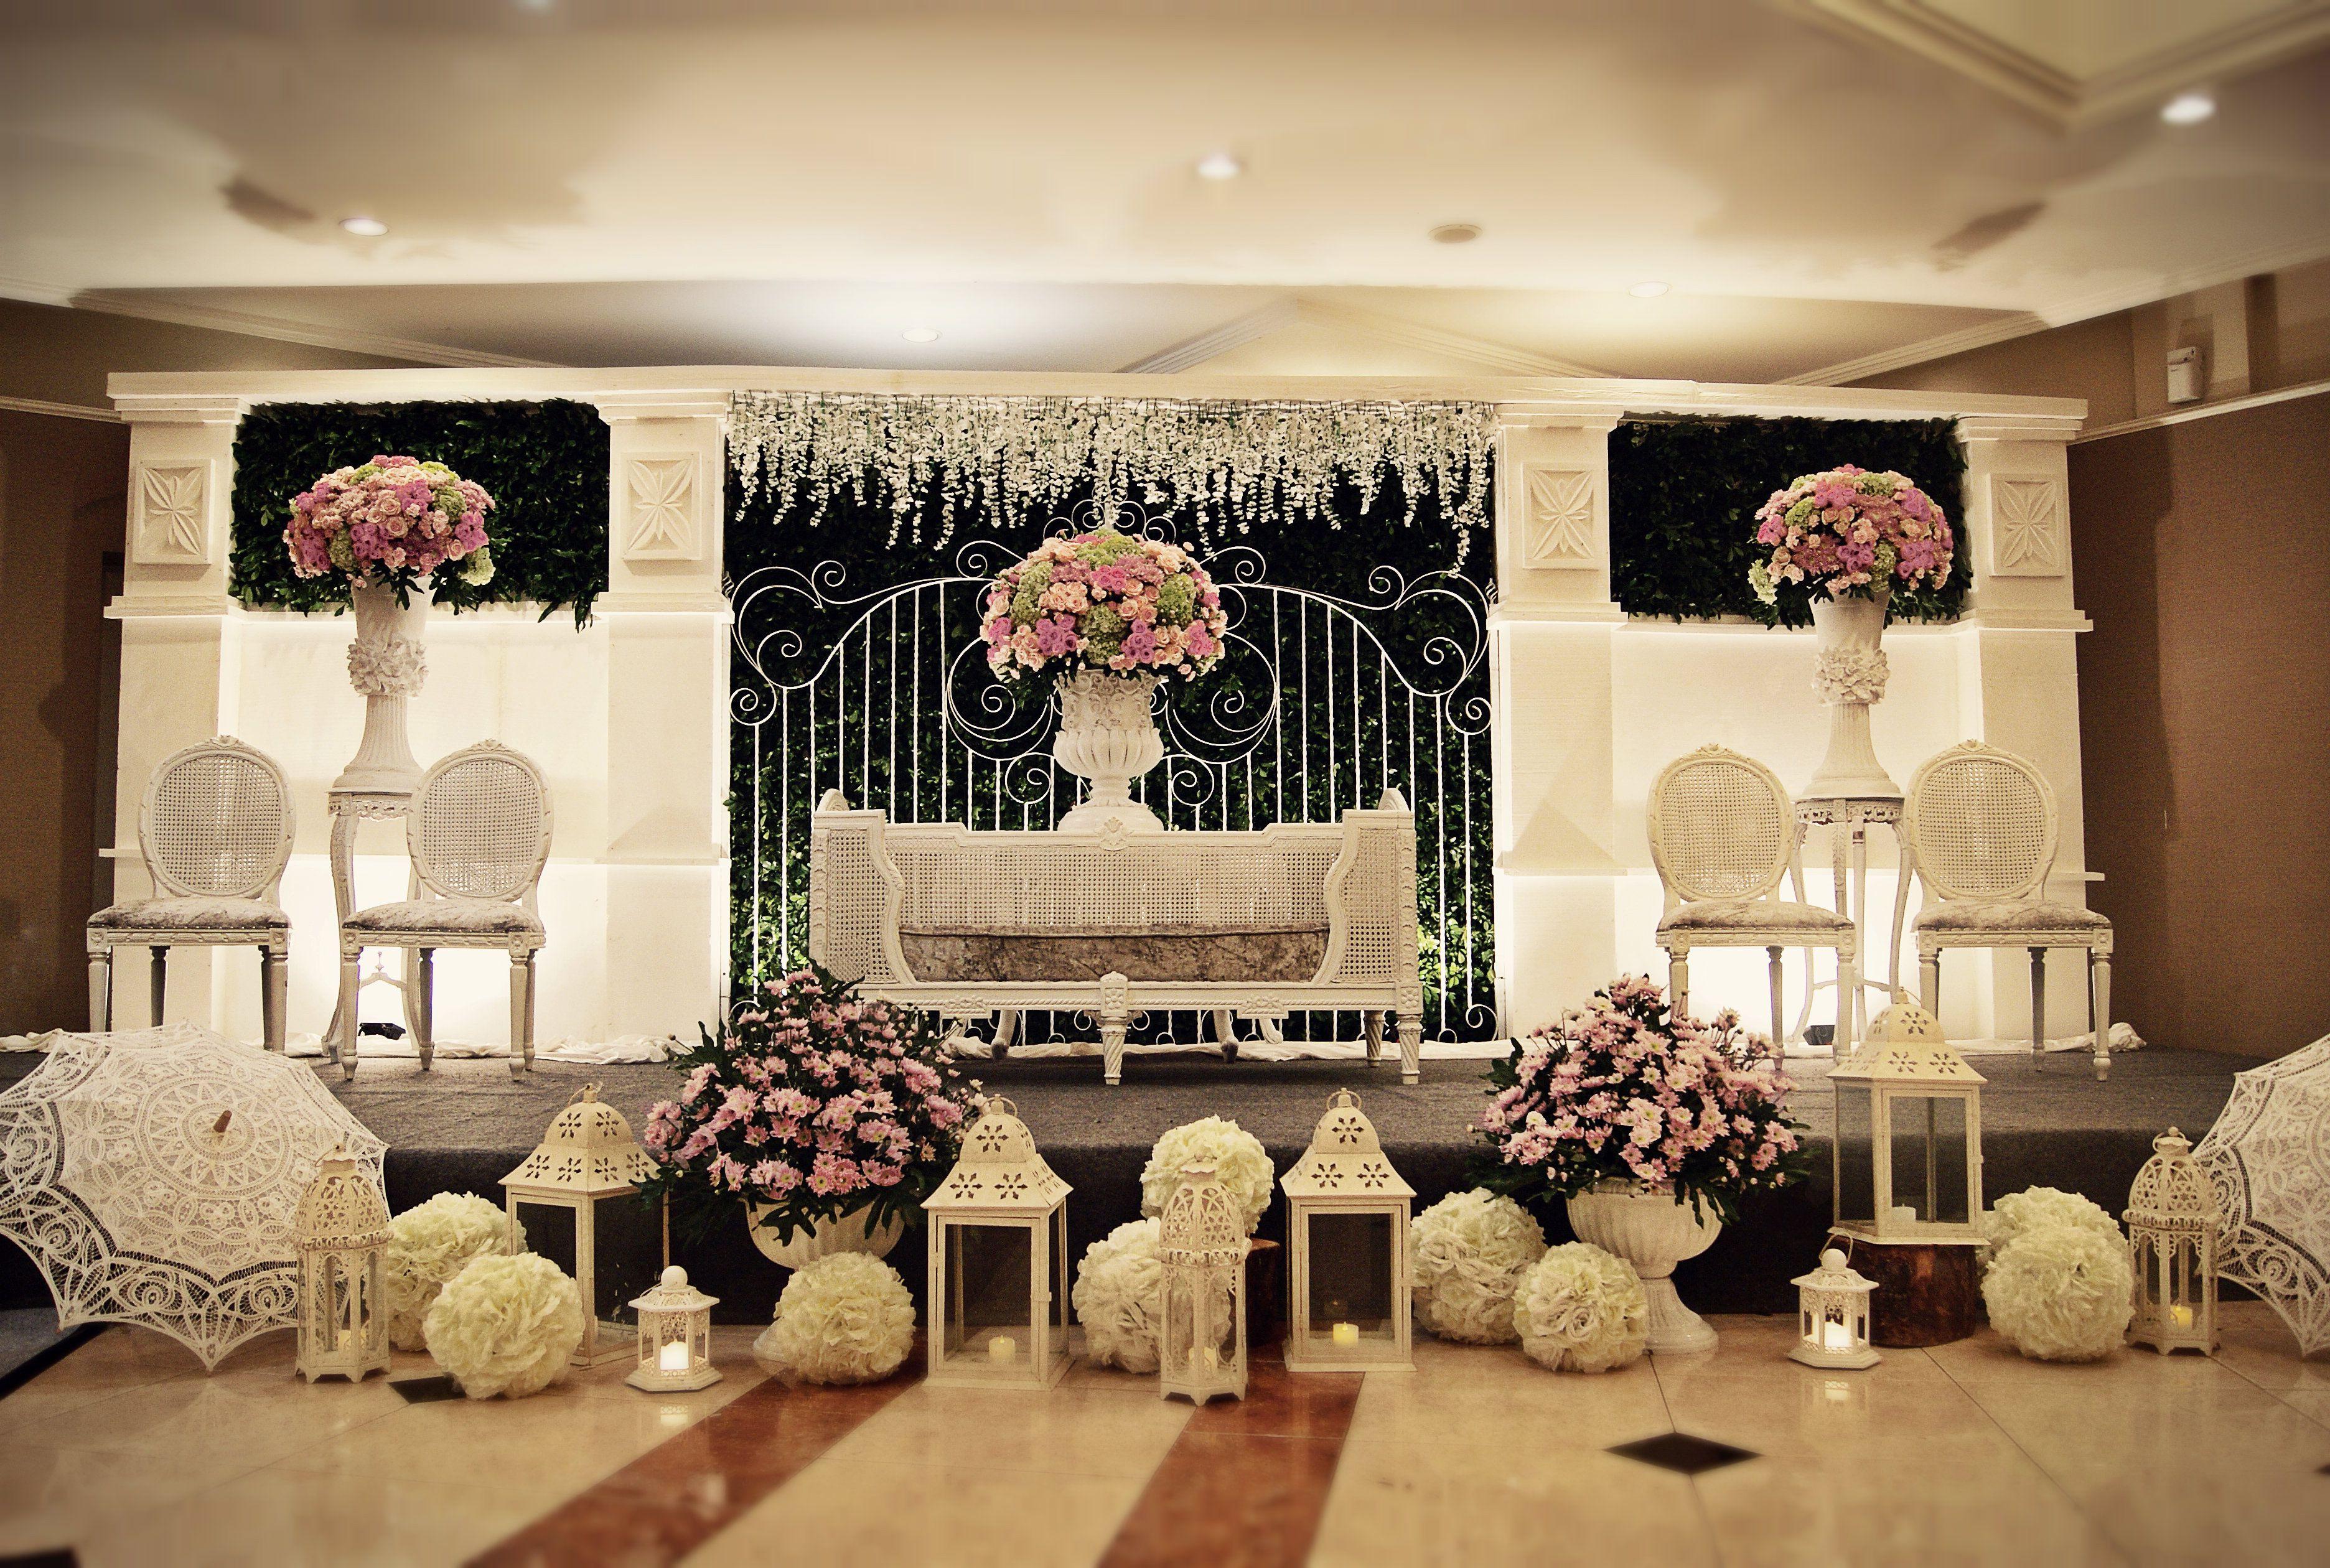 Vintage wedding furniture decor - Pelaminan Bridal Stage With Green Leaves Wall White Furniture Vintage